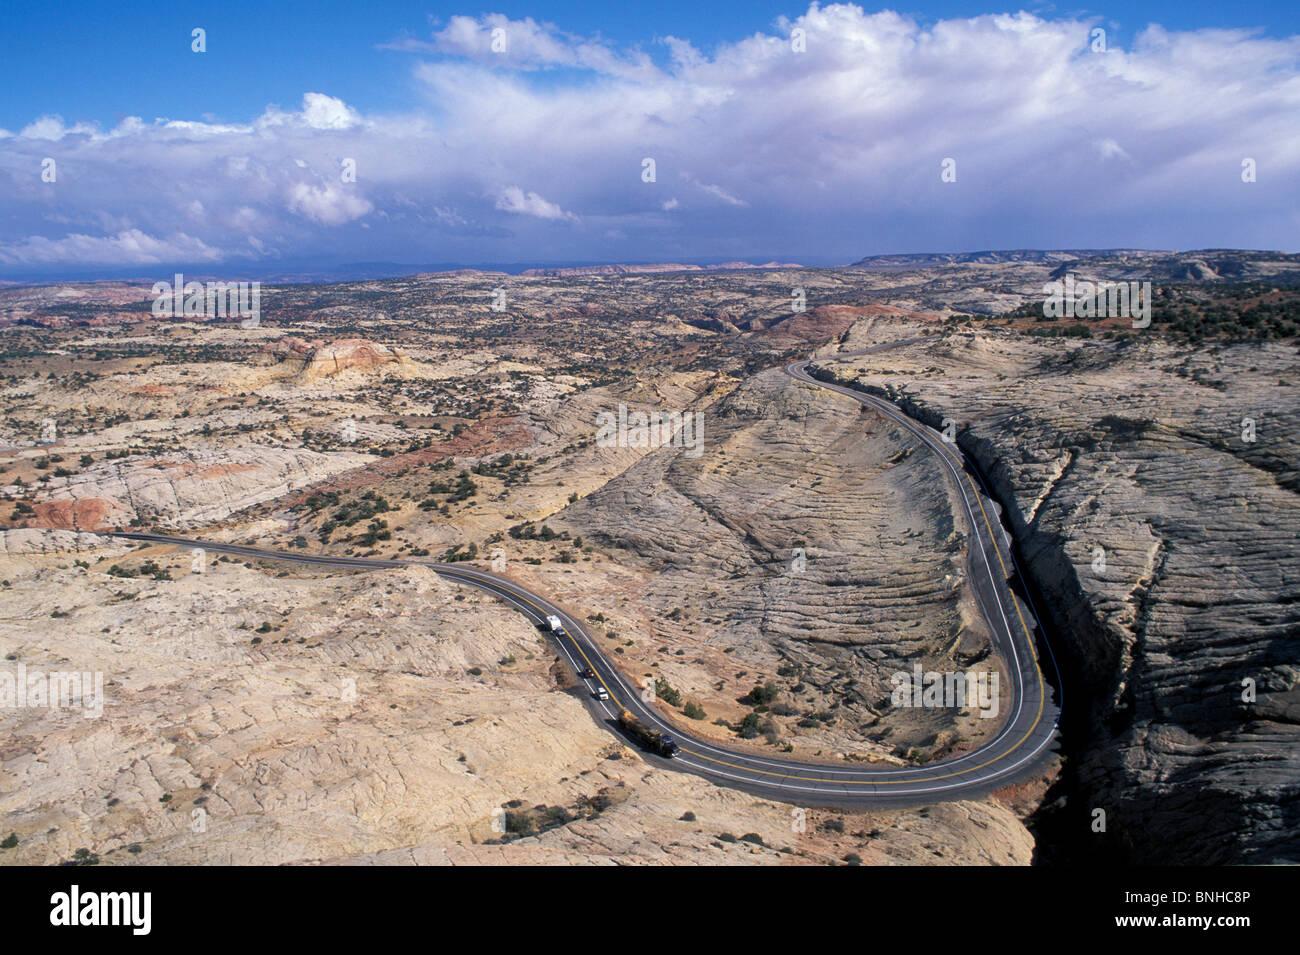 Usa Escalante Utah Highway 12 Near Escalante Grand Staircase Escalante National Monument Road Landscape Scenery - Stock Image